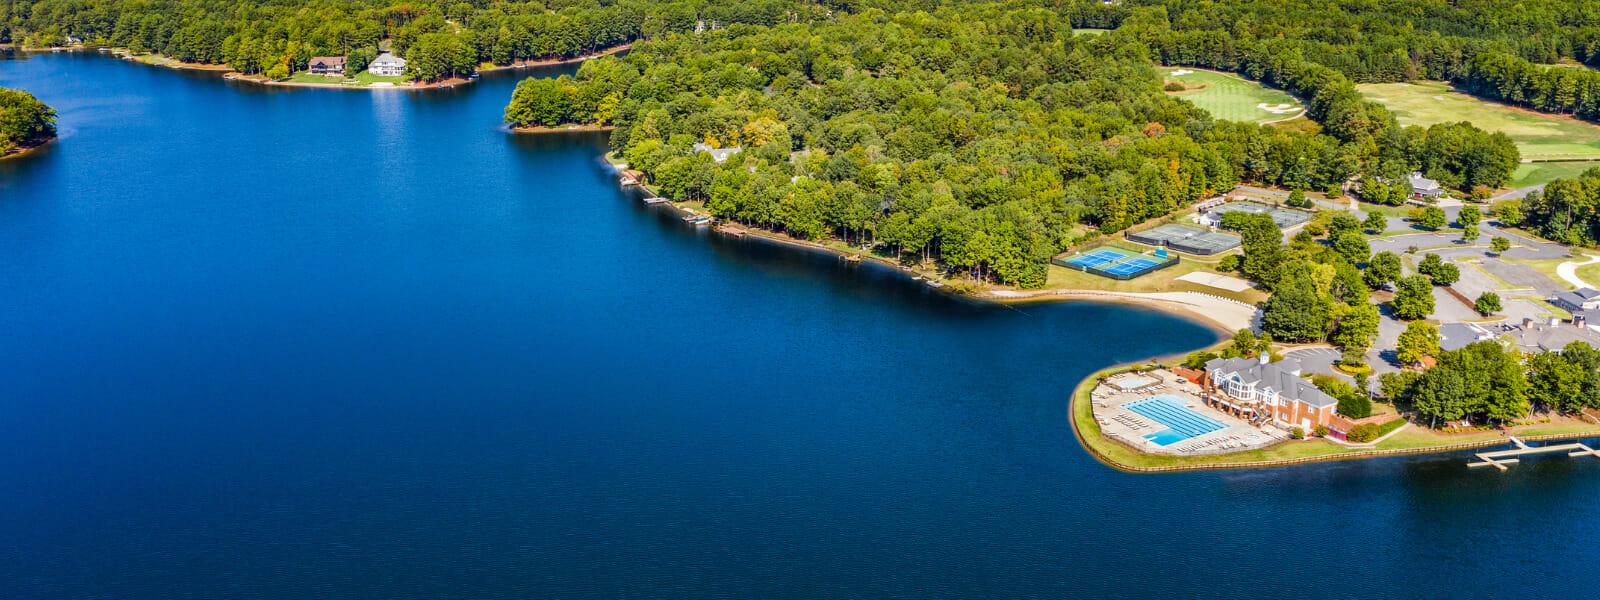 Fawn Lake | Virginia Retirement Communities | VA Gated Communities